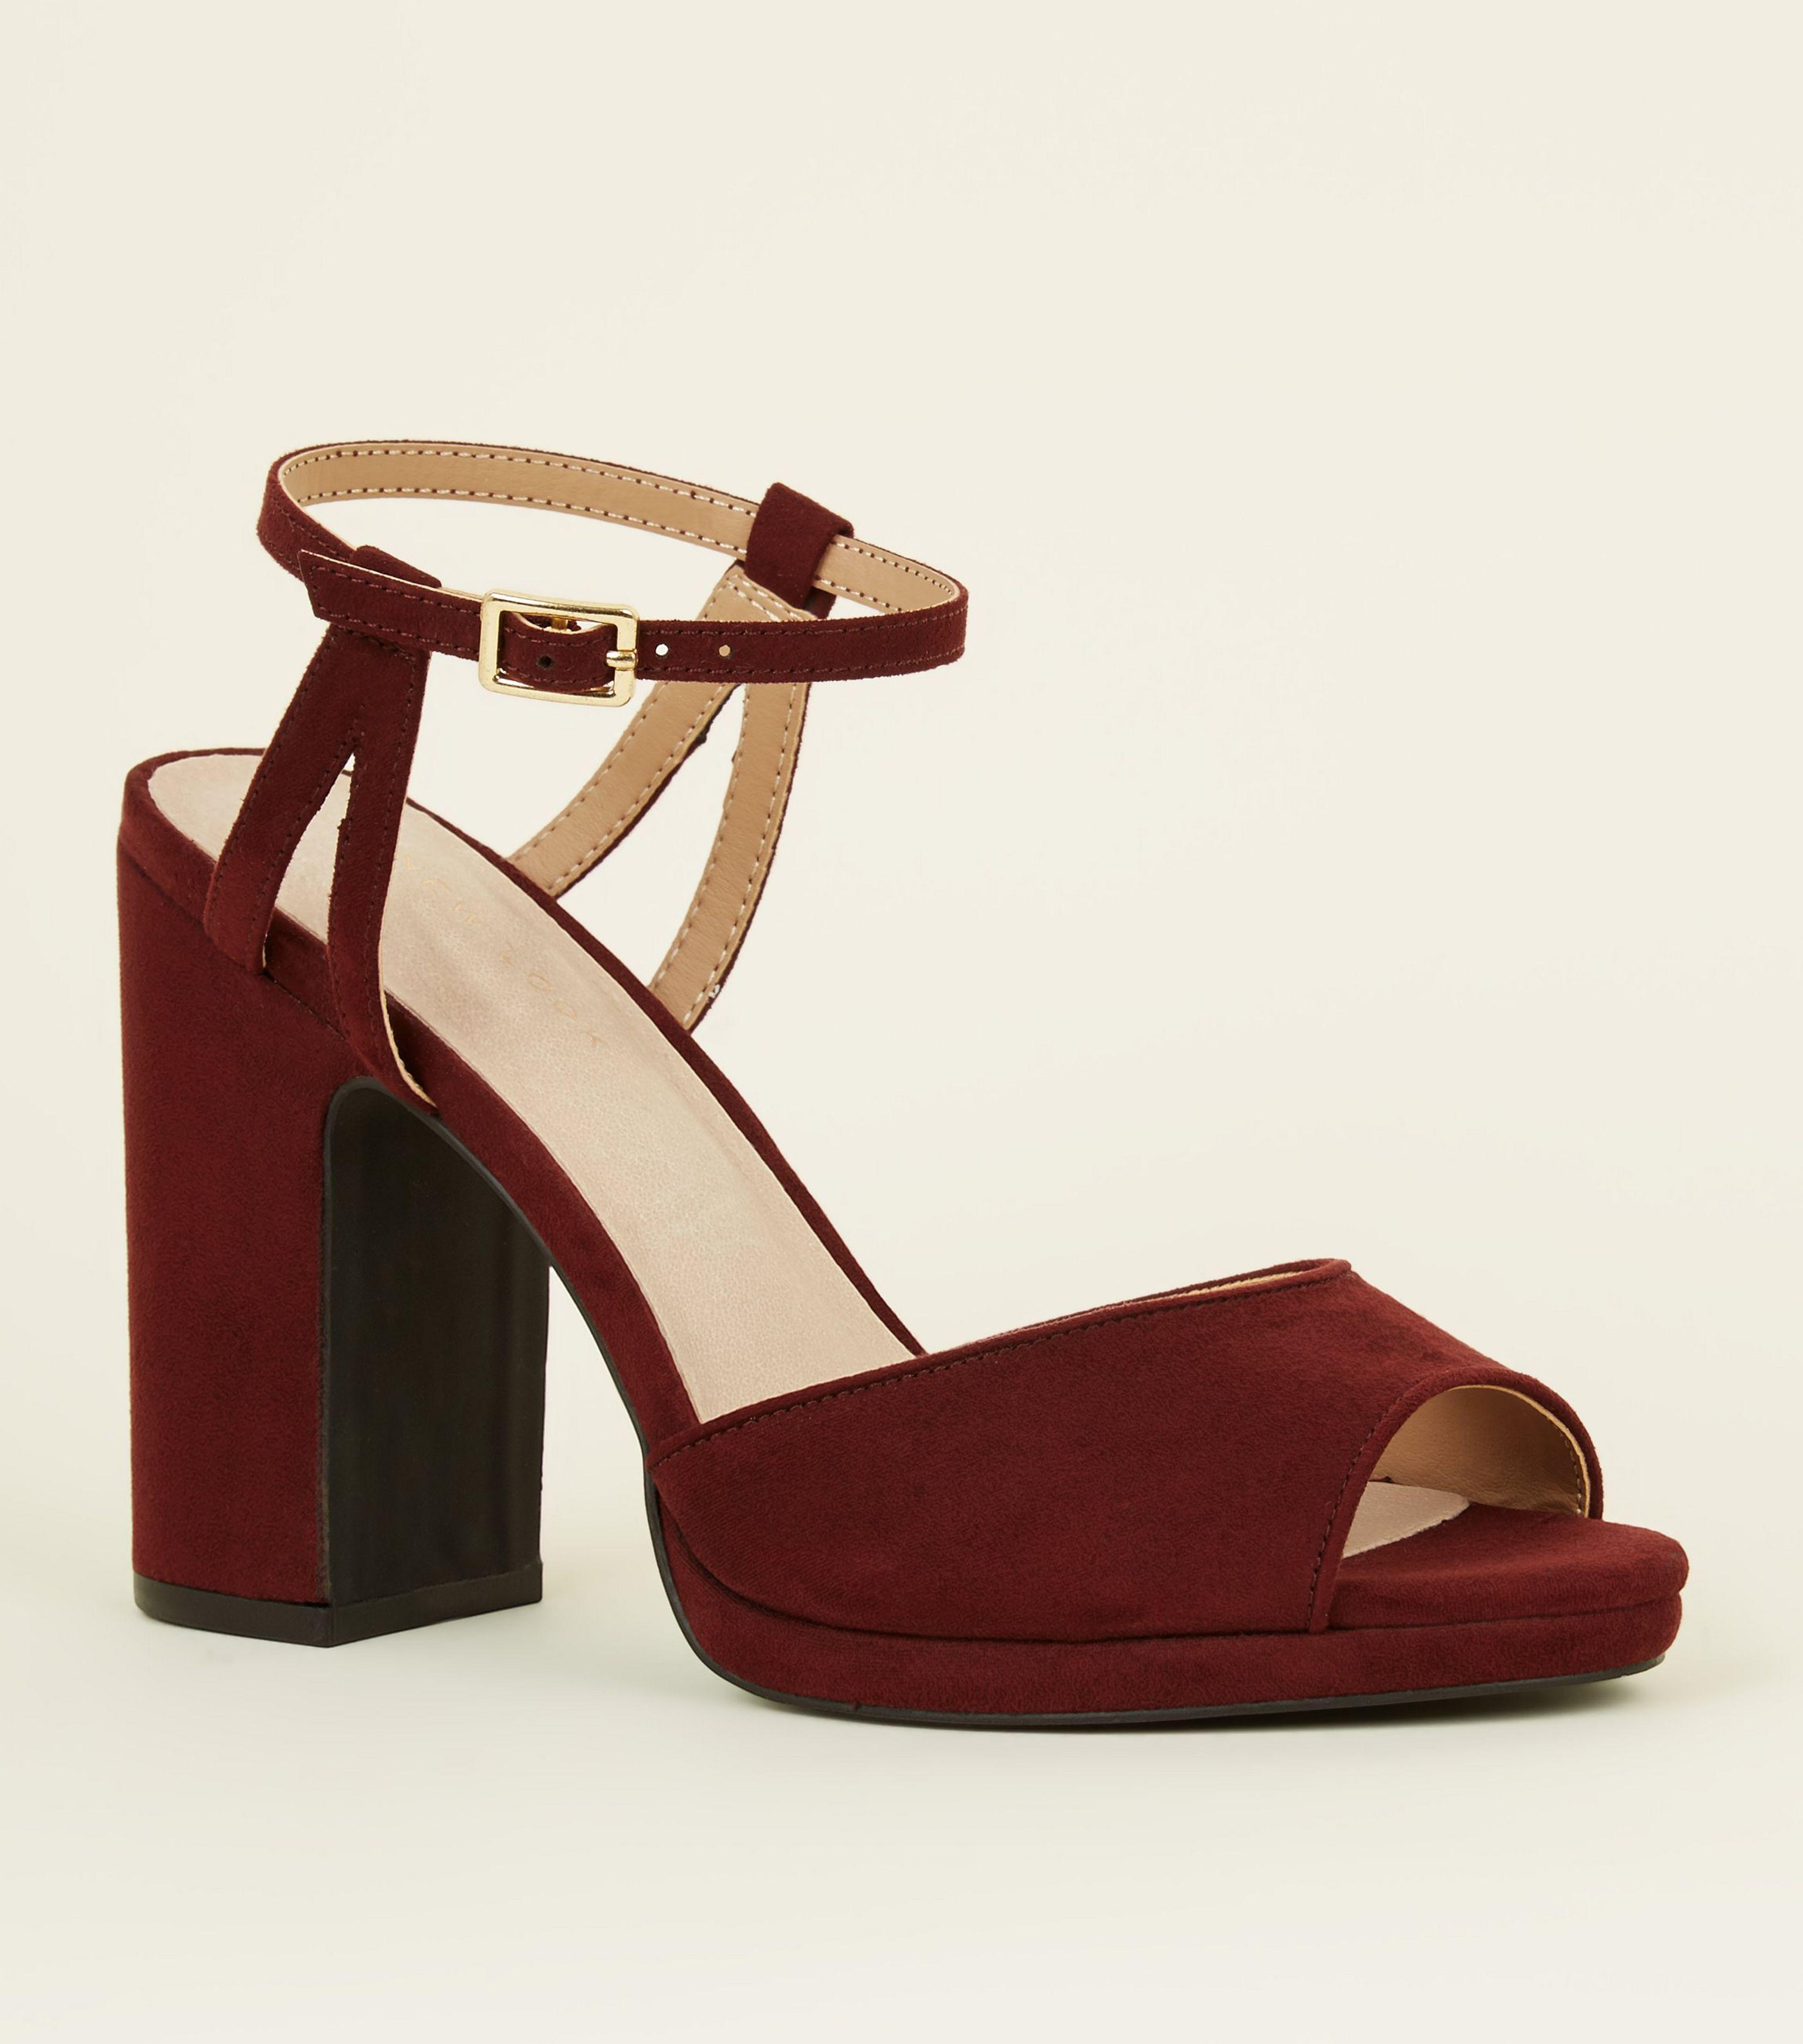 3daf3b18de1 New Look Burgundy Comfort Peep Toe Platform Block Heels in Red - Lyst